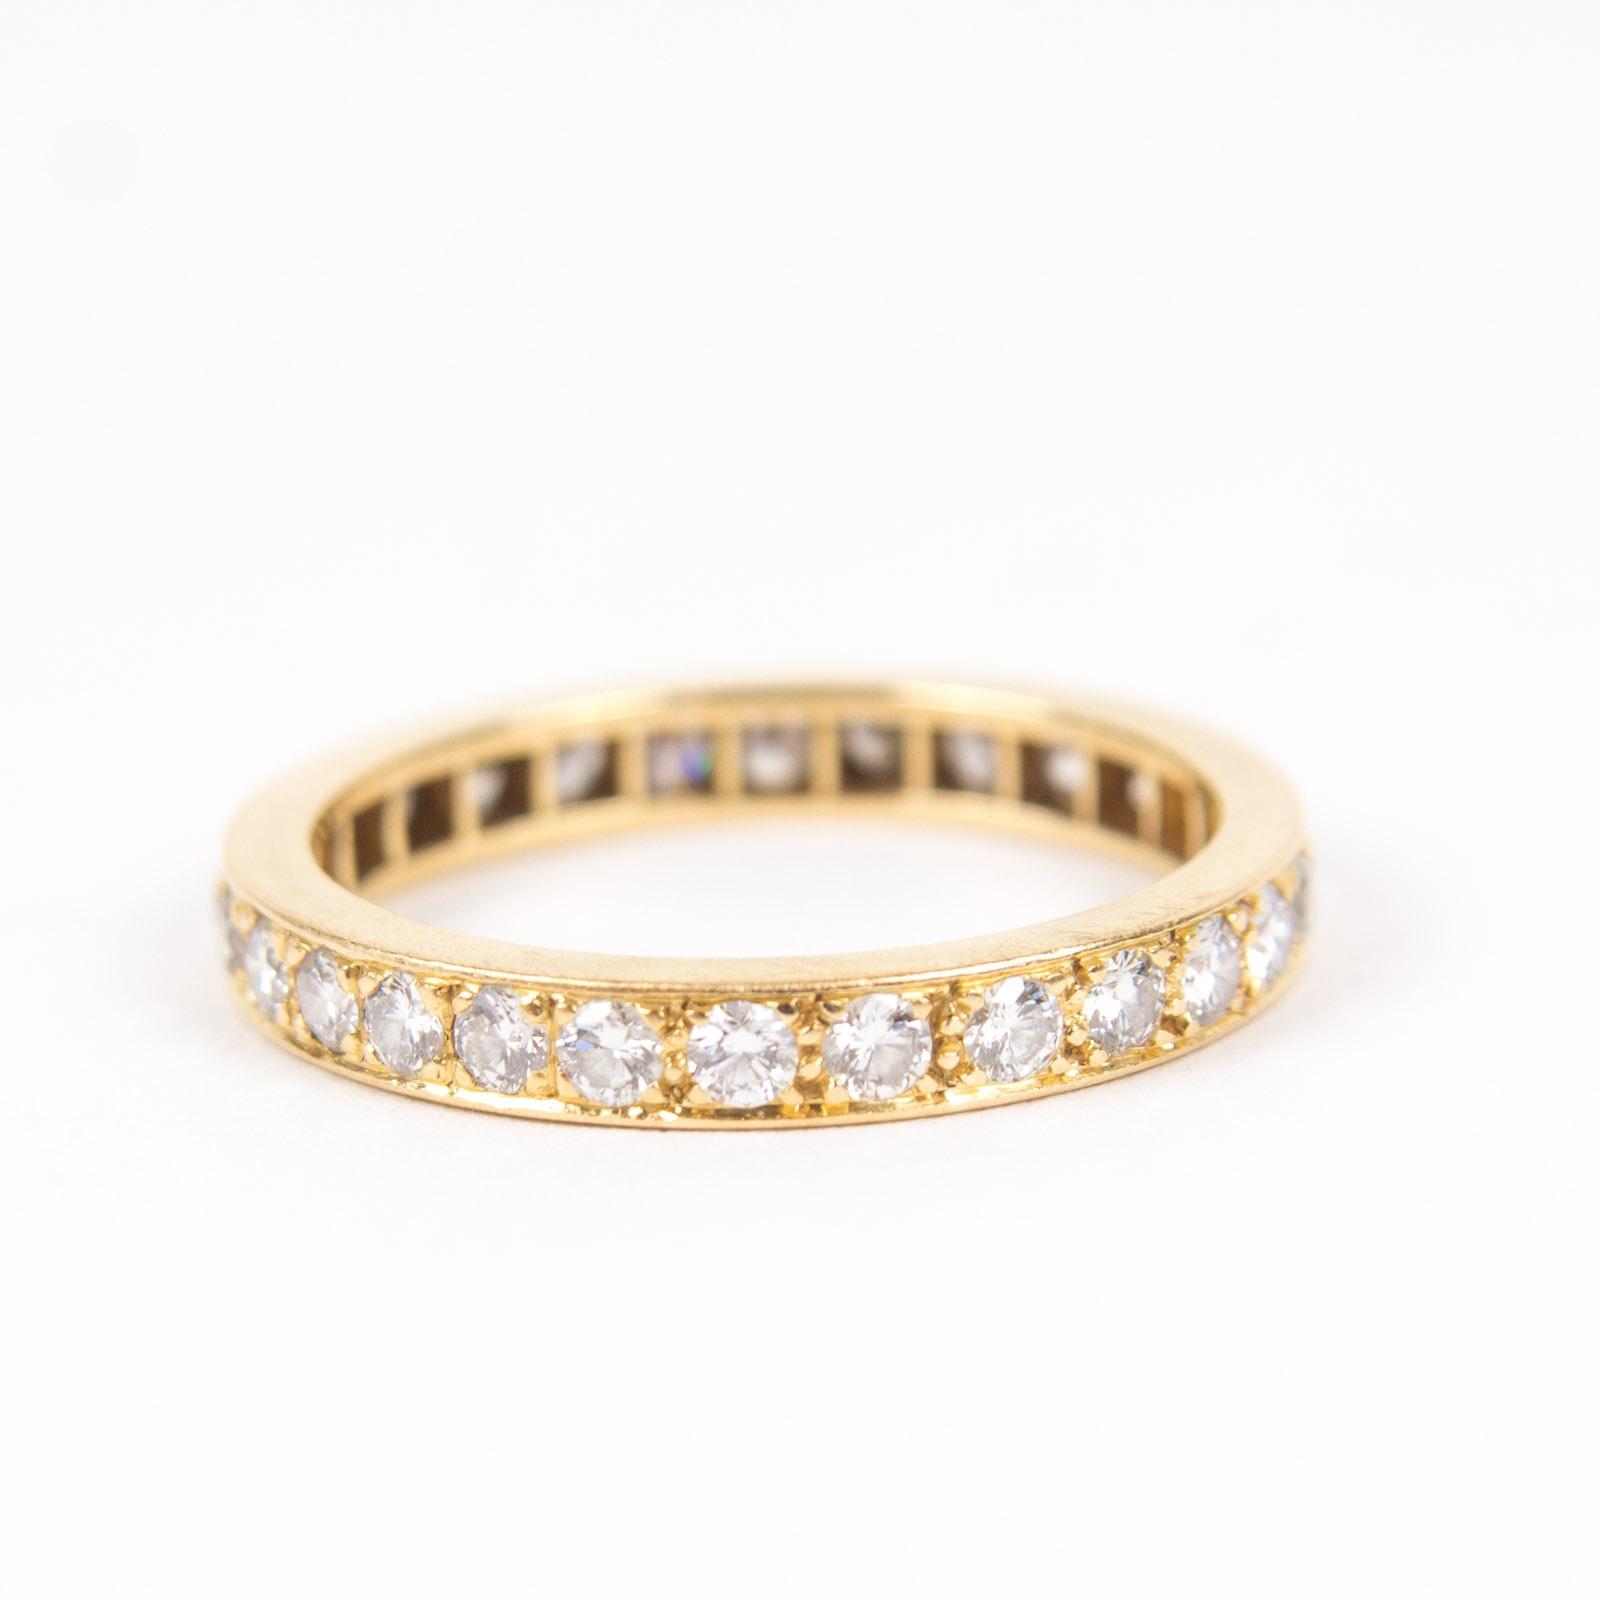 18K Yellow Gold and 1.05 CTW Diamond Eternity Ring